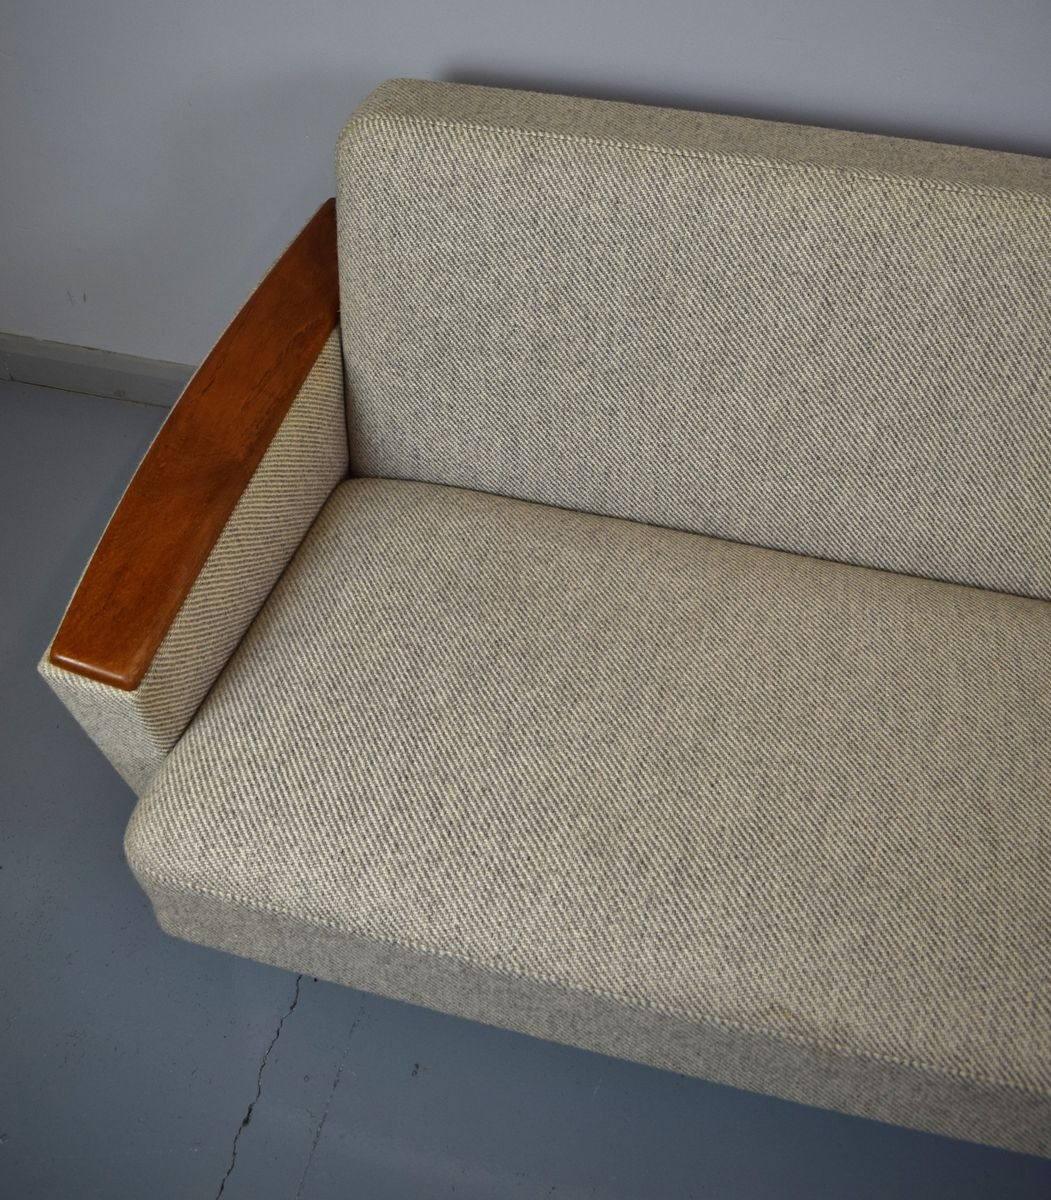 mid century buchenholz 3 sitzer sofa bei pamono kaufen. Black Bedroom Furniture Sets. Home Design Ideas